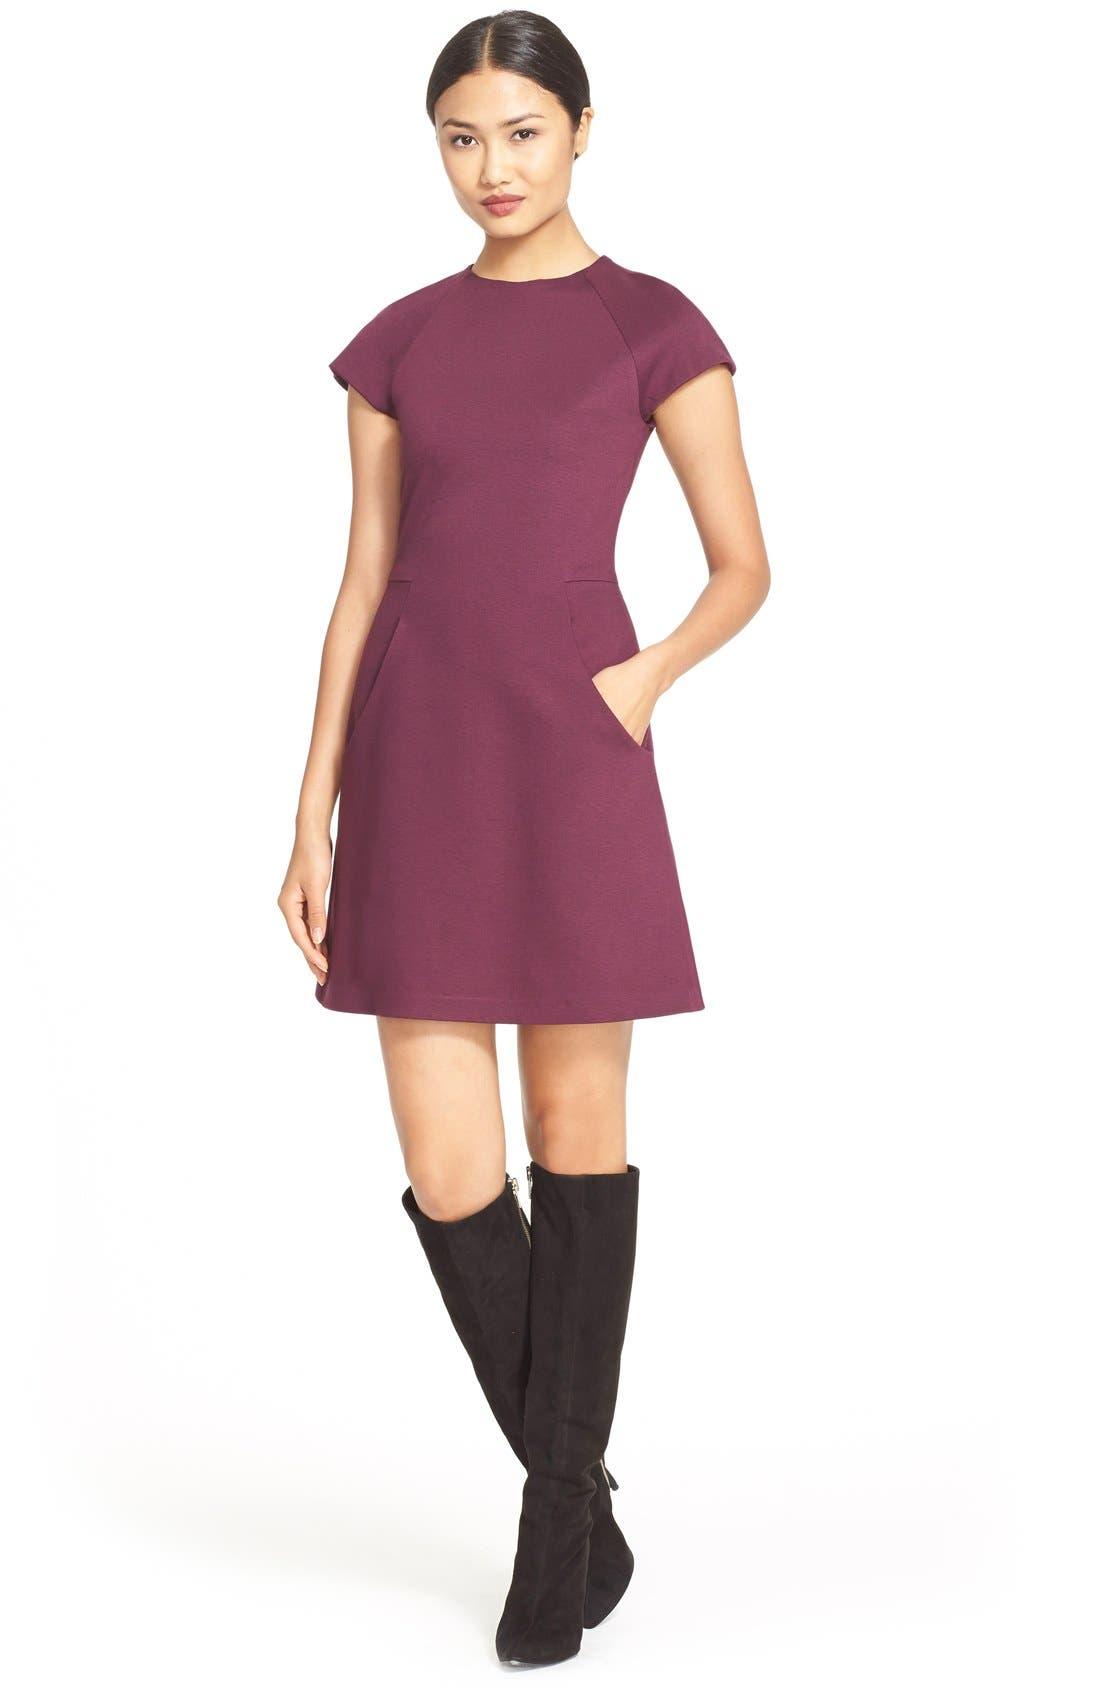 ALICE + OLIVIA 'Reanne' Fit & Flare Dress, Main, color, 502